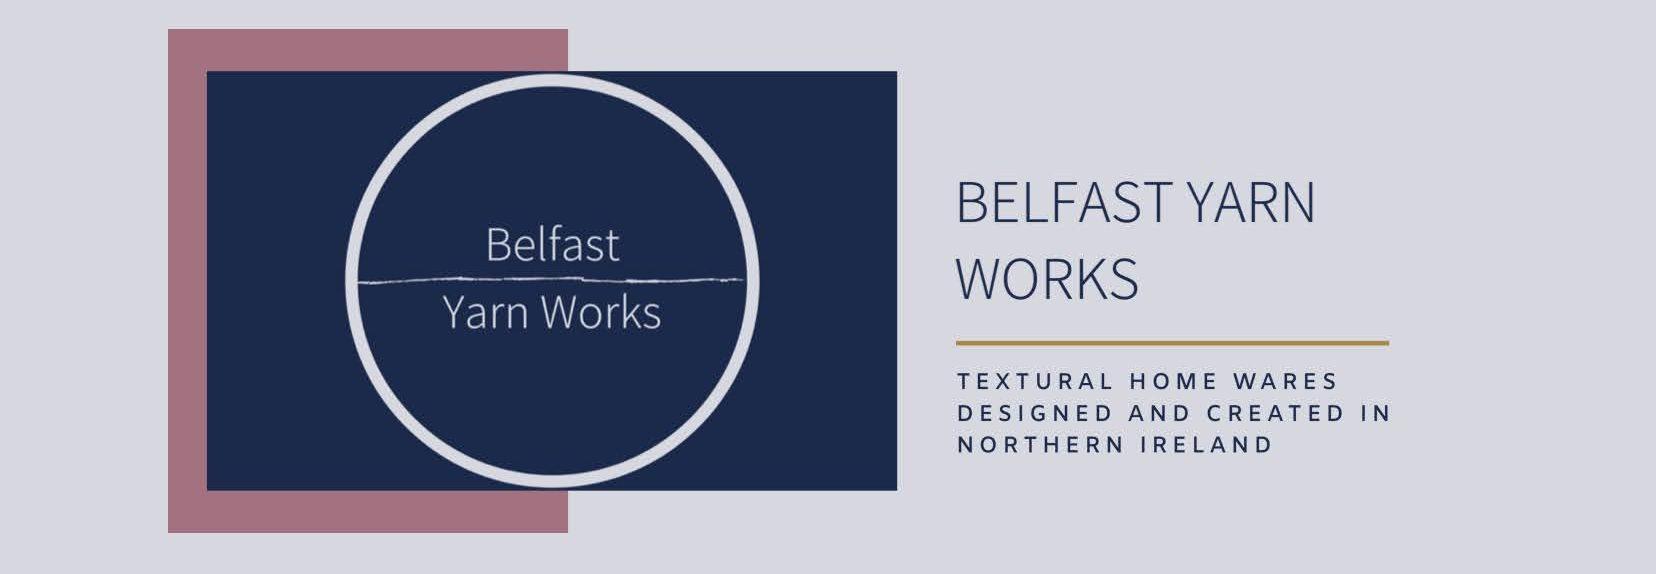 Belfast Yarn Works